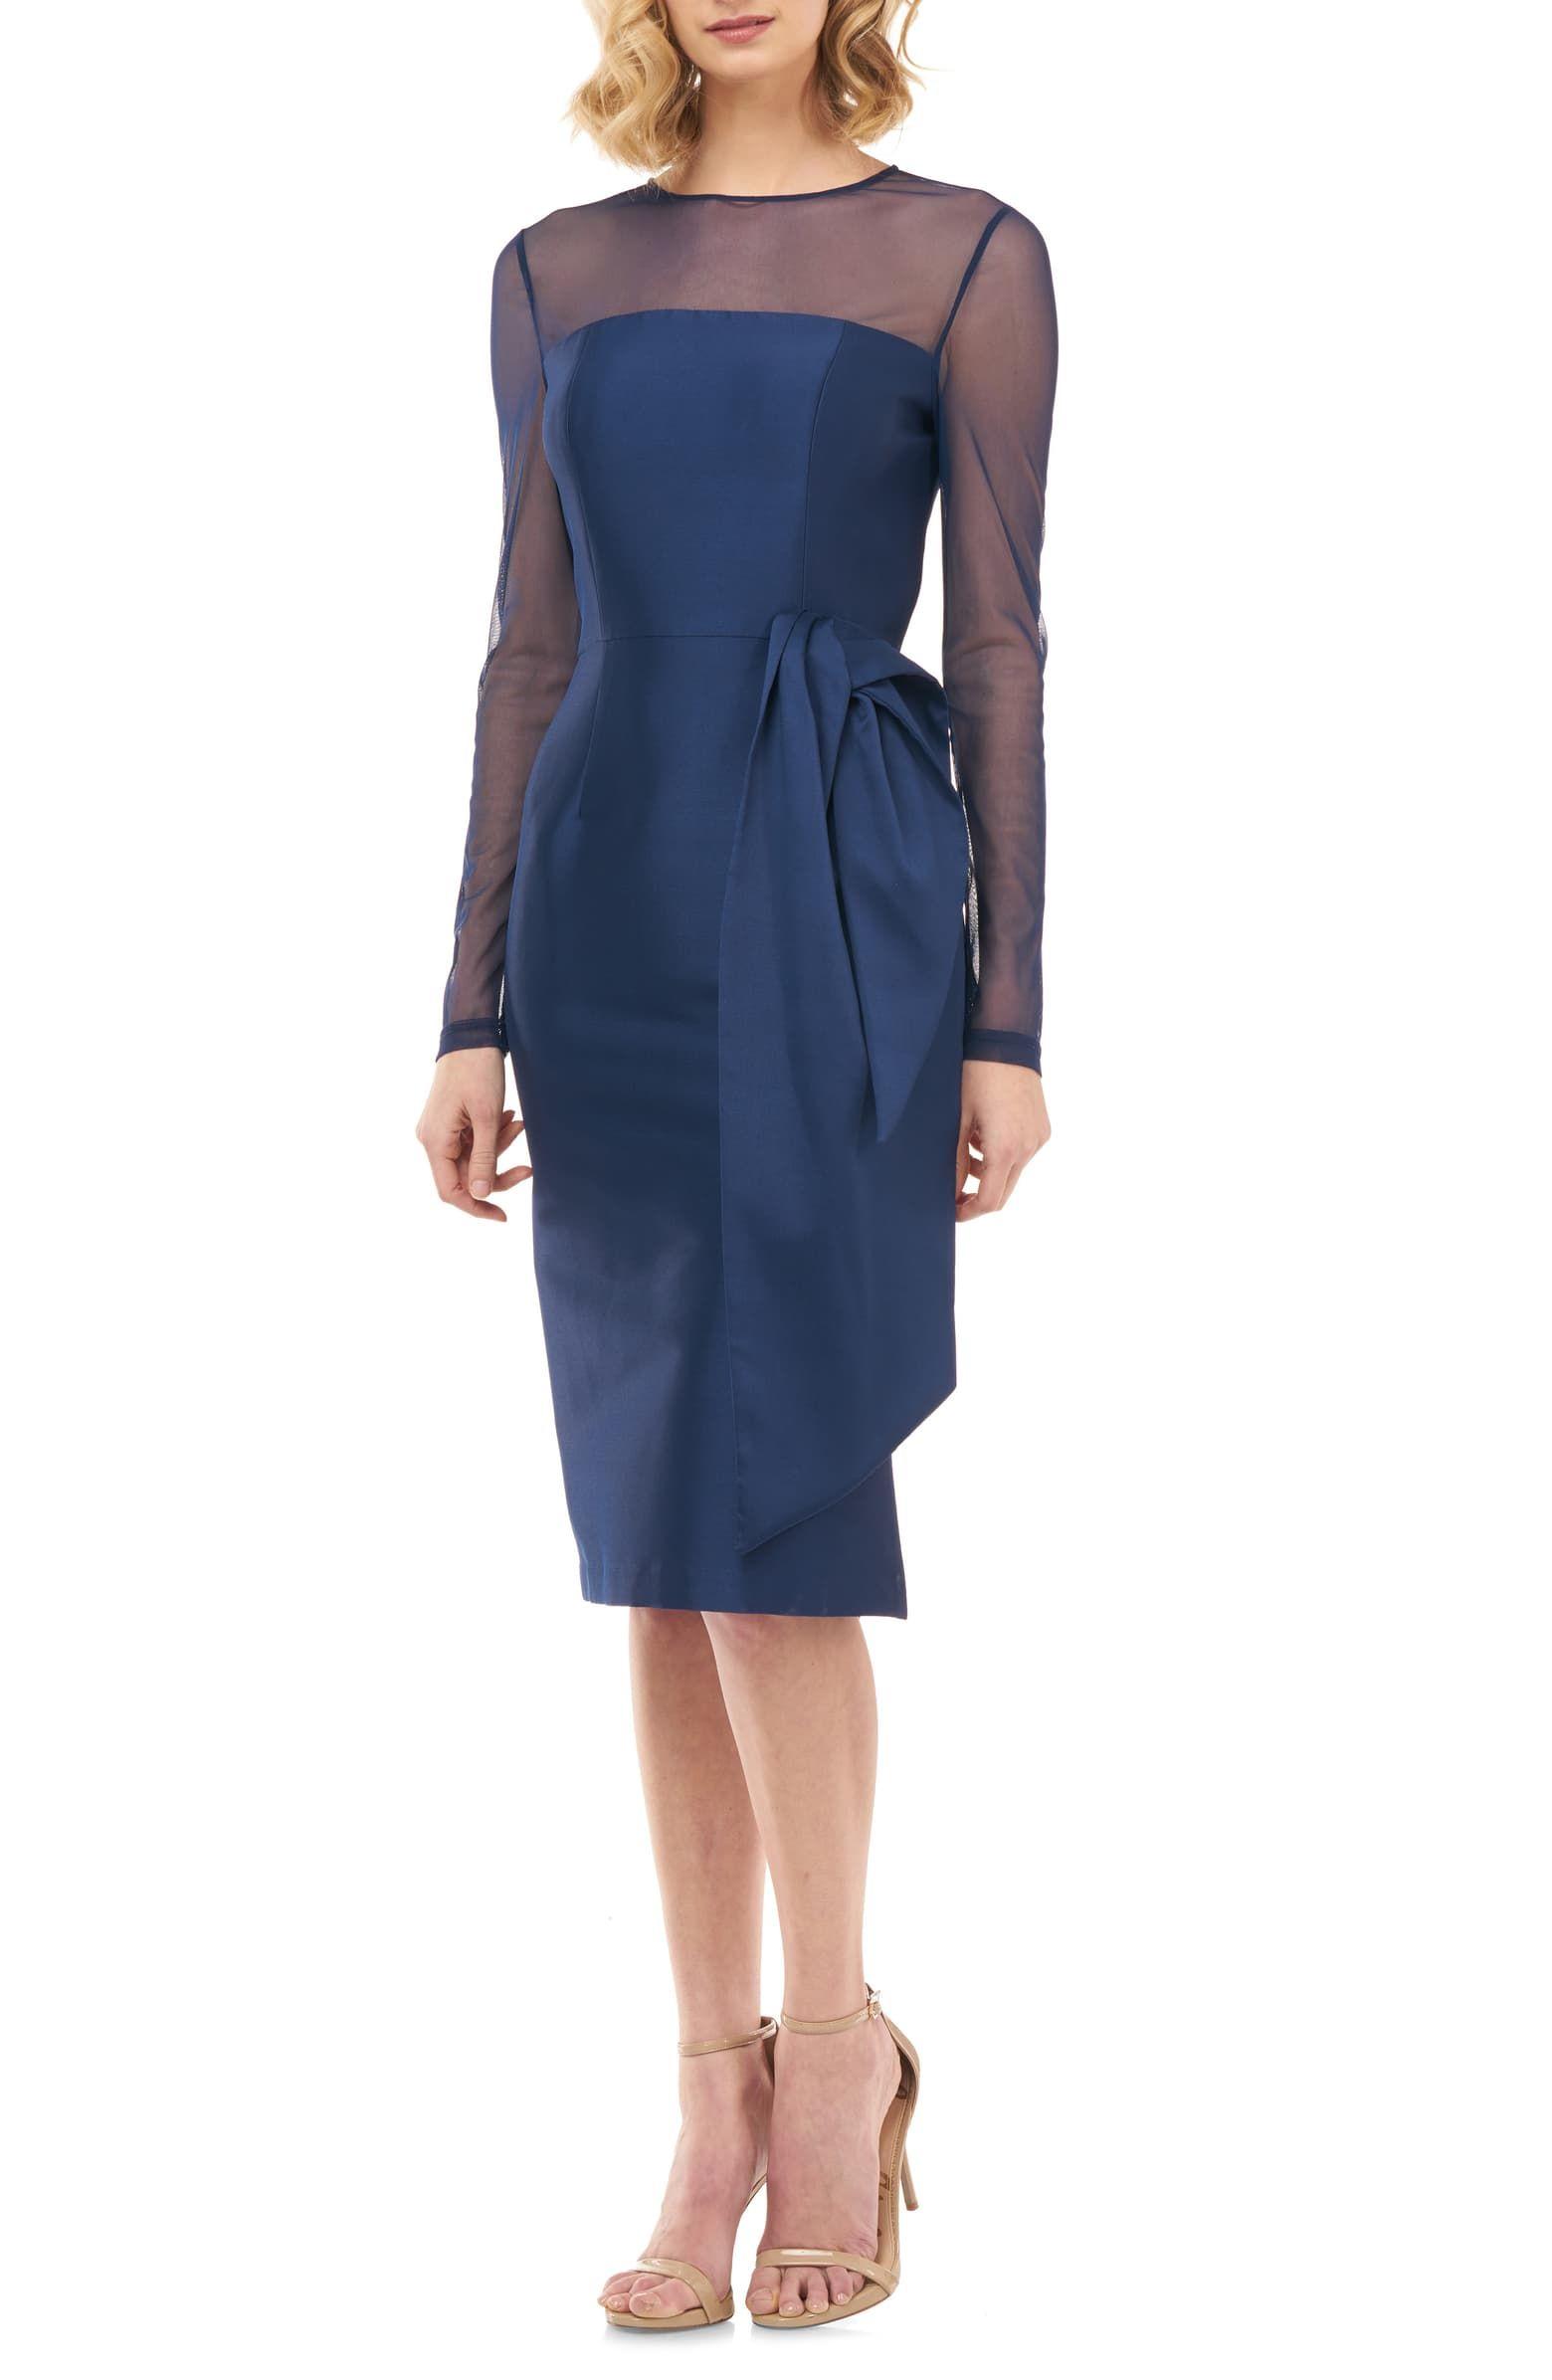 Kay Unger Illusion Neck Long Sleeve Mikado Cocktail Dress Nordstrom Cocktail Dress Long Sleeve Cocktail Dress Fashion Clothes Women [ 2392 x 1560 Pixel ]